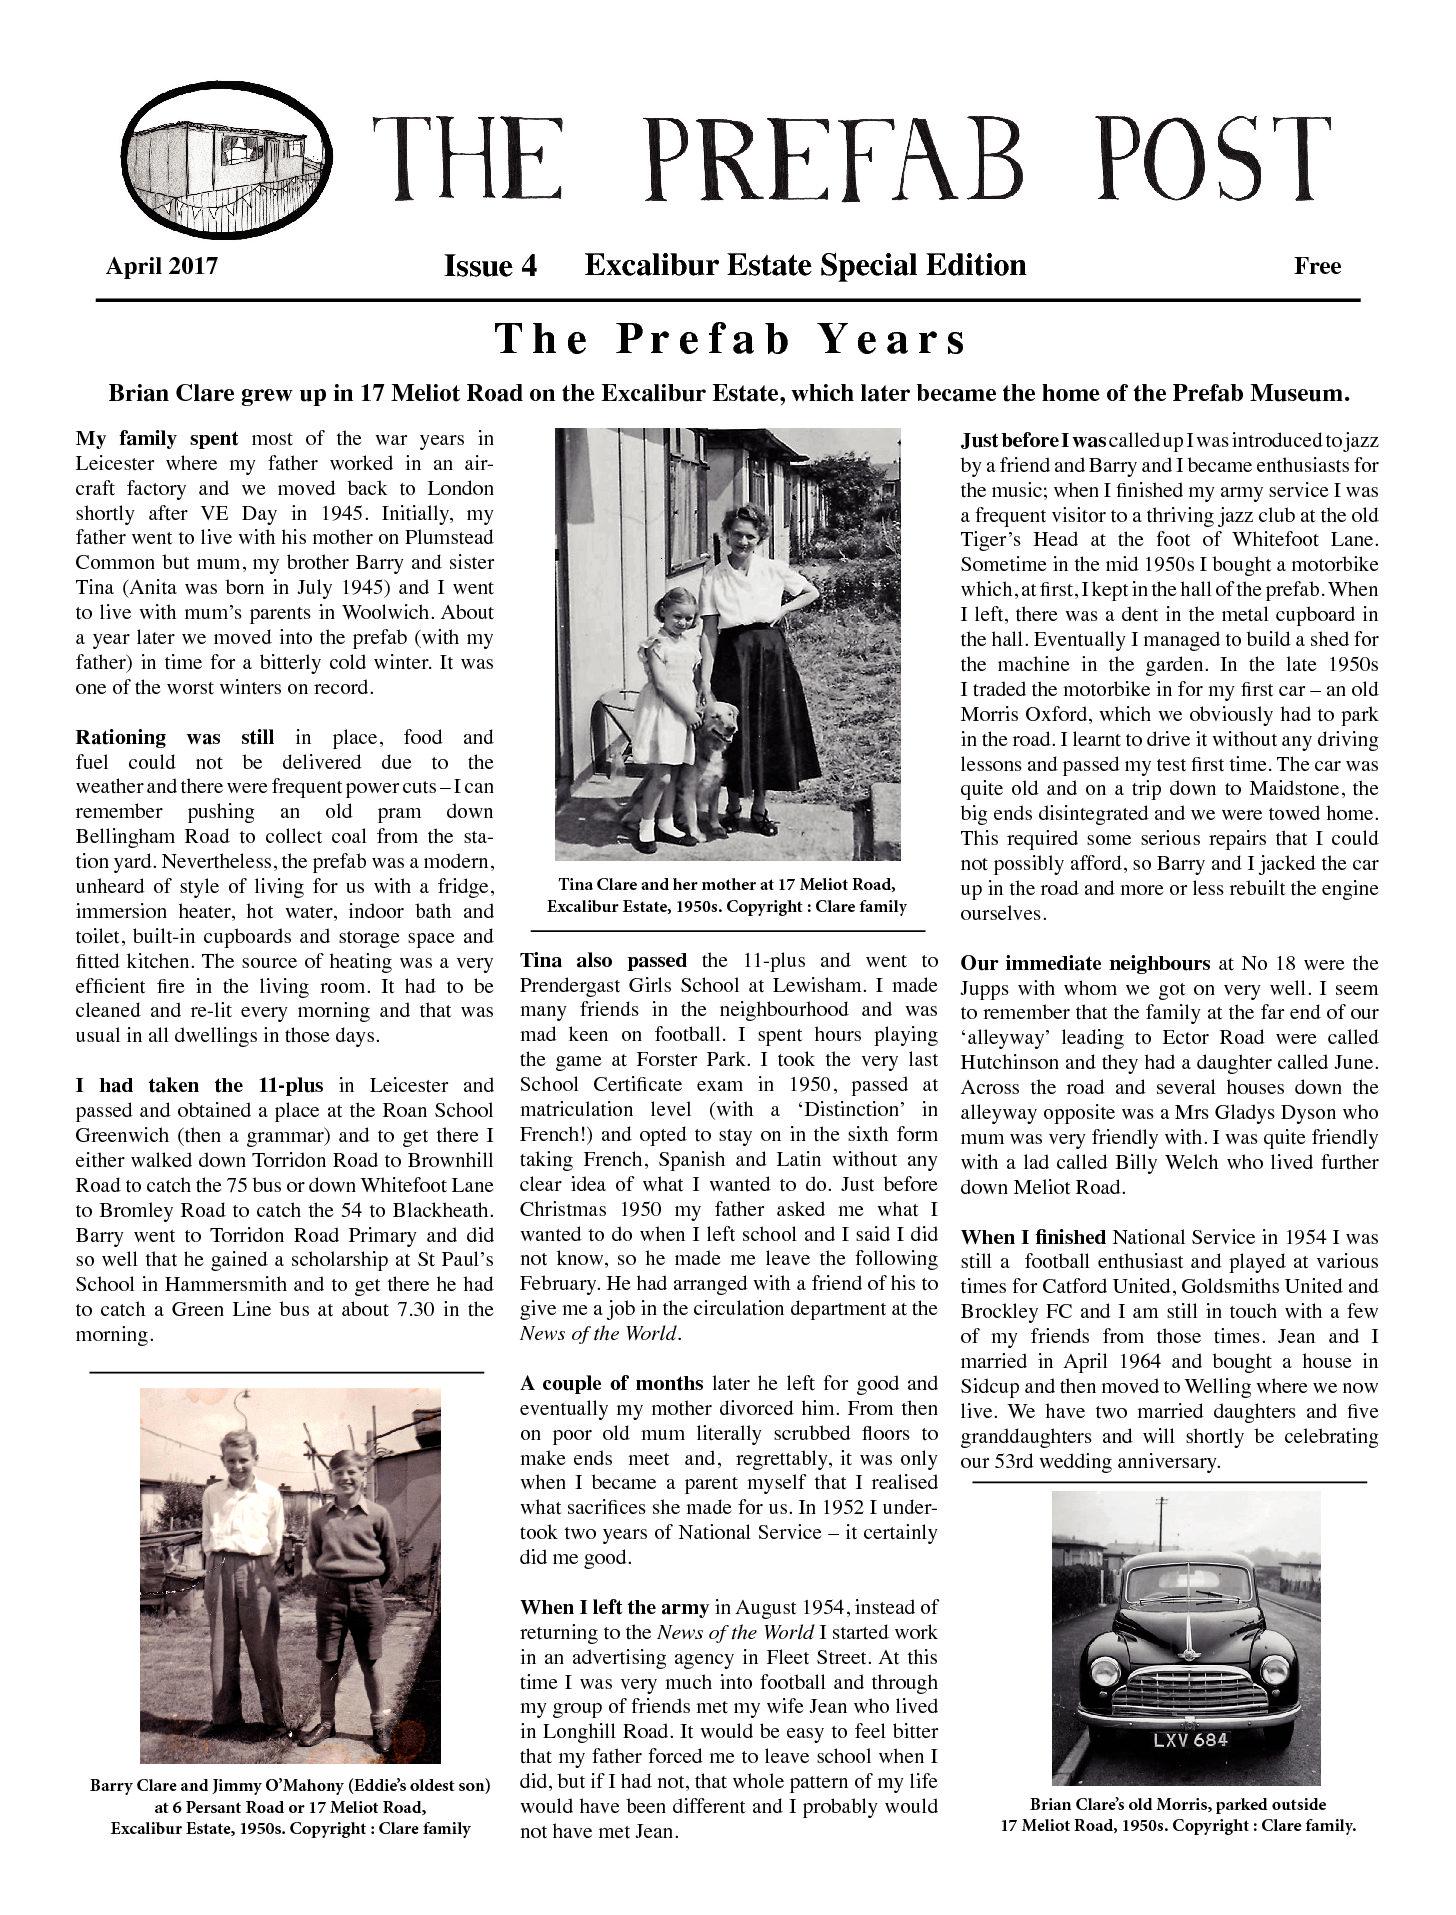 Moving Prefab: Prefab Post Issue 4